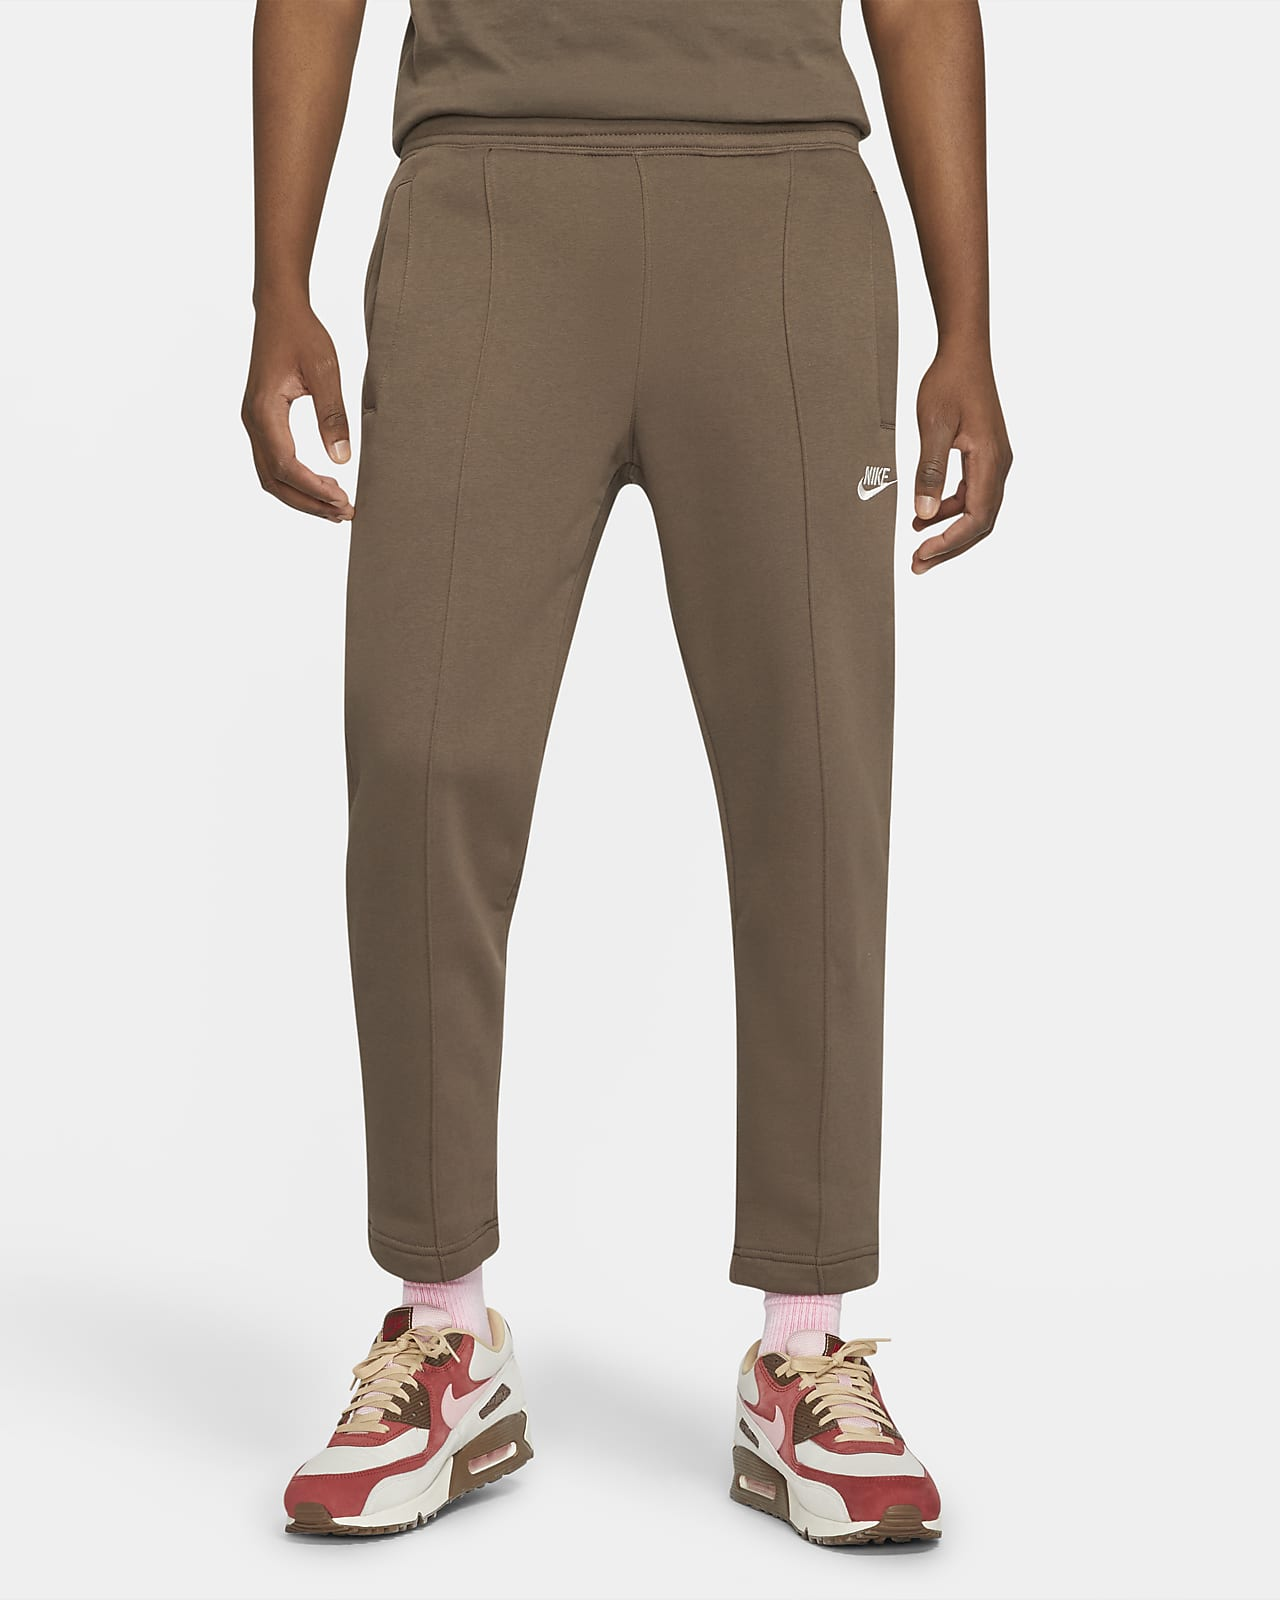 Calças Nike Sportswear para homem